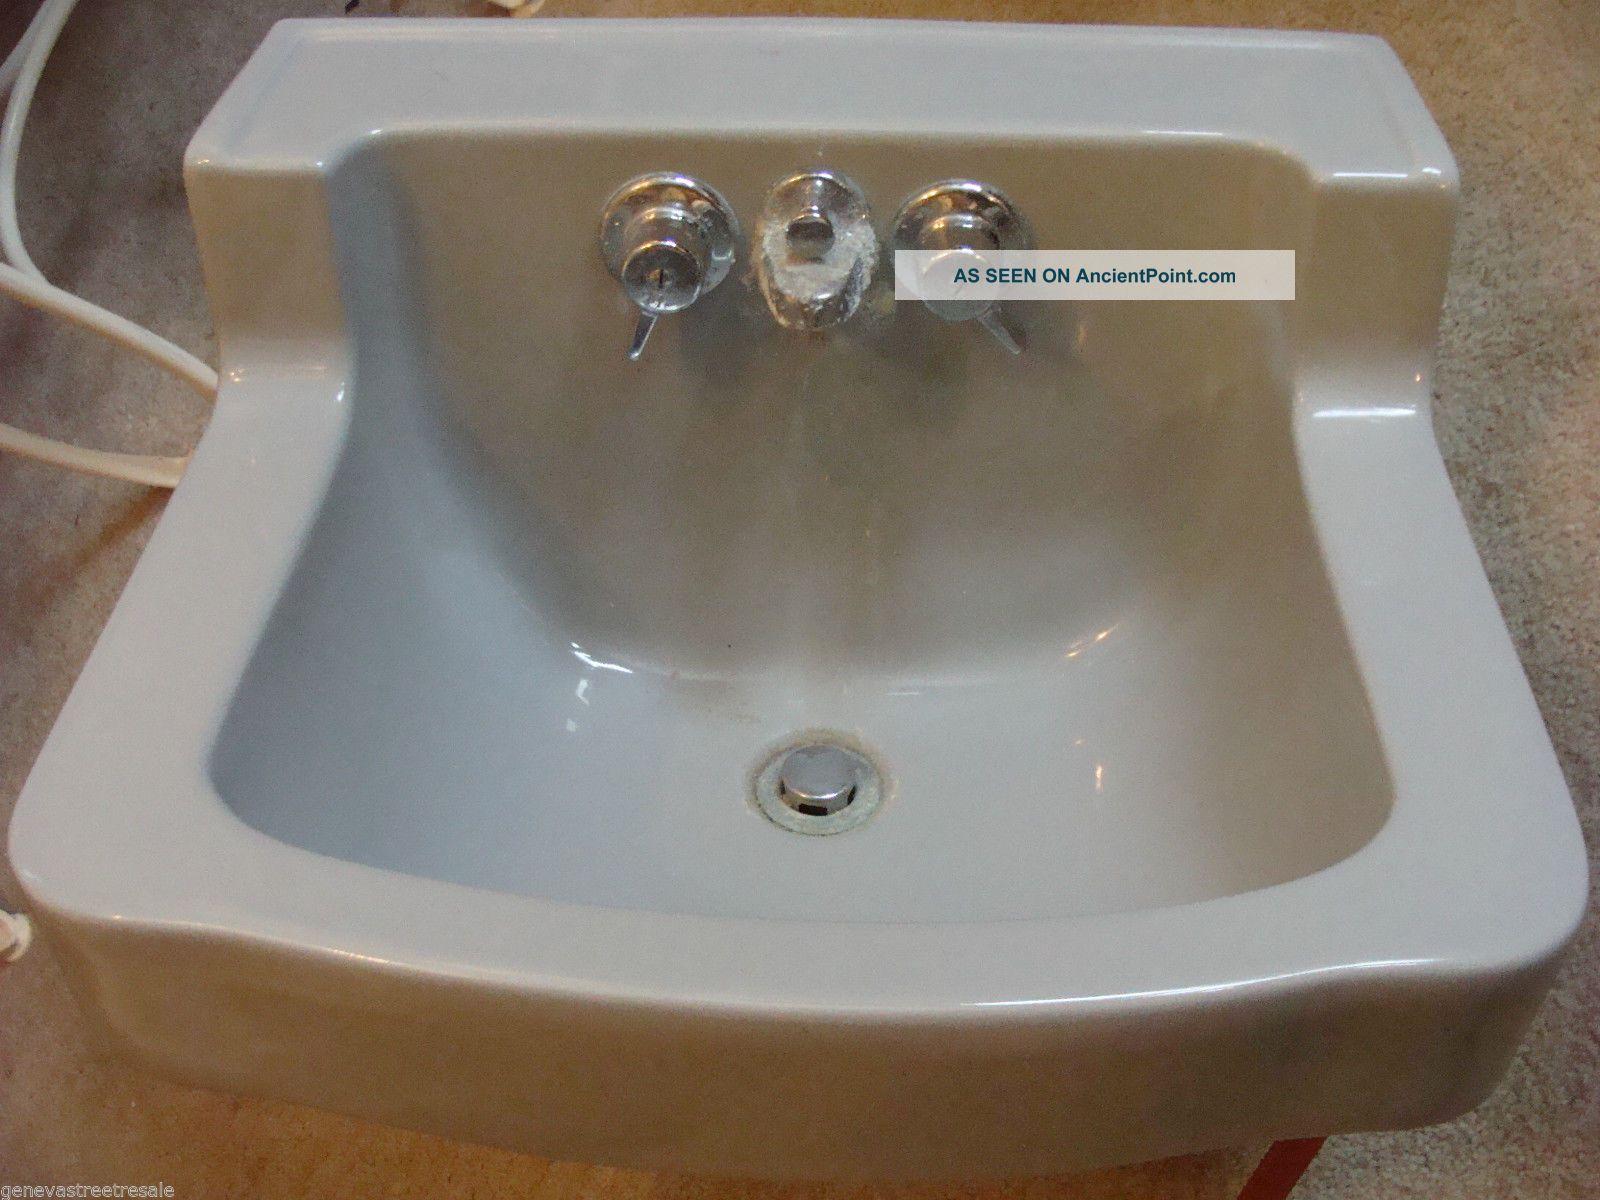 Vintage Briggs Bathroom Kitchen Gray Porcelain Sink W/fixtures Mid Century Sinks photo